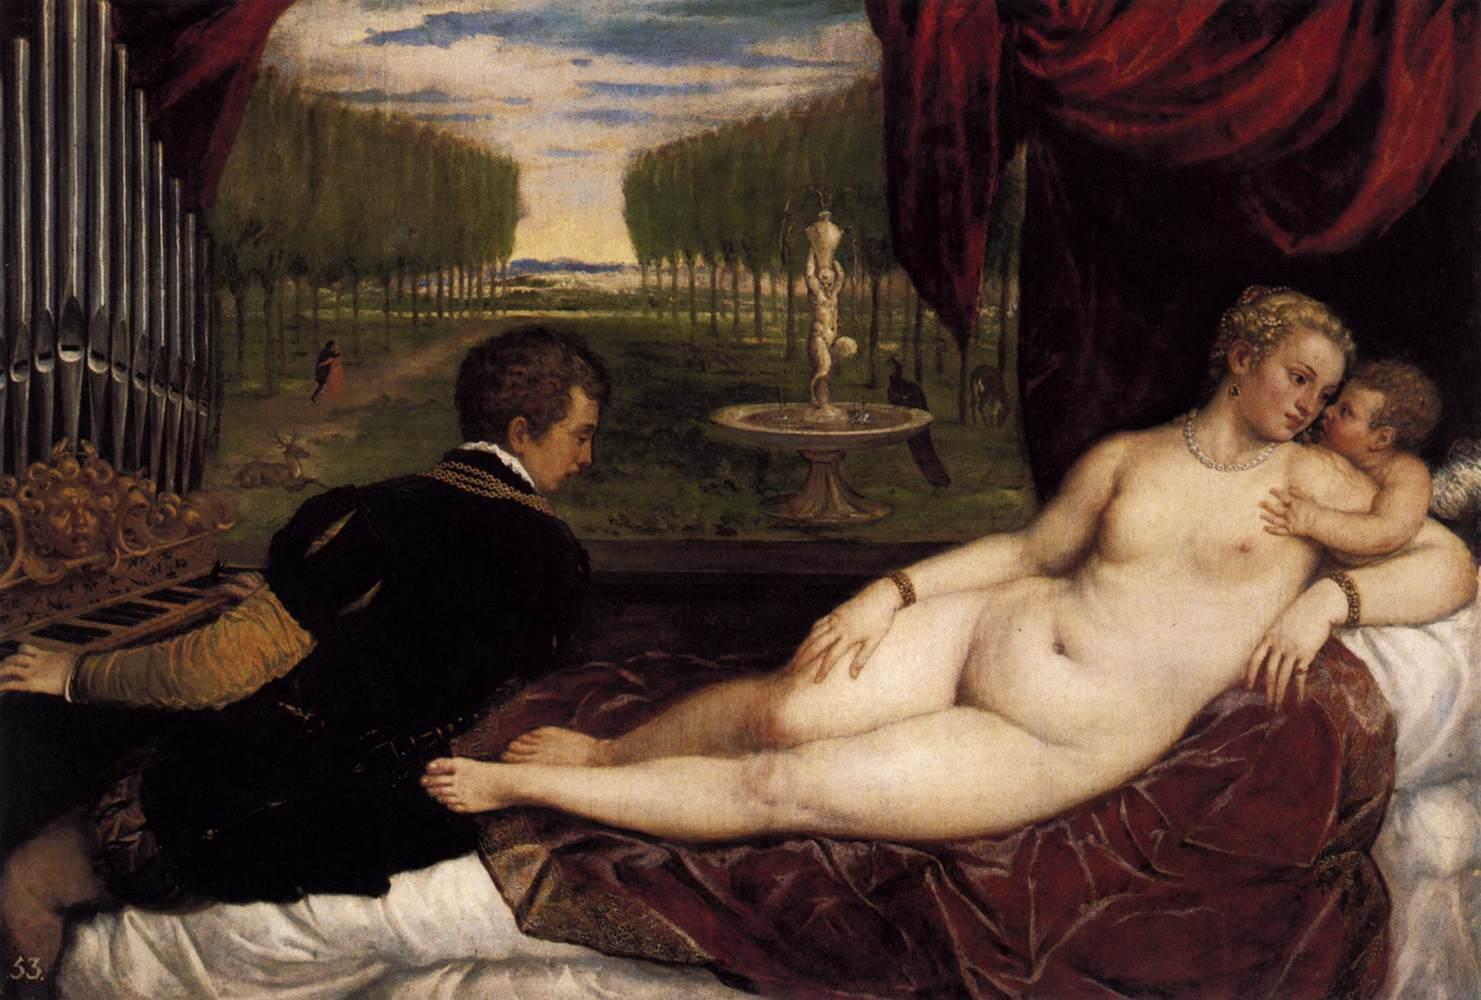 Venus with Organist and Cupid سے طرف کی Titian